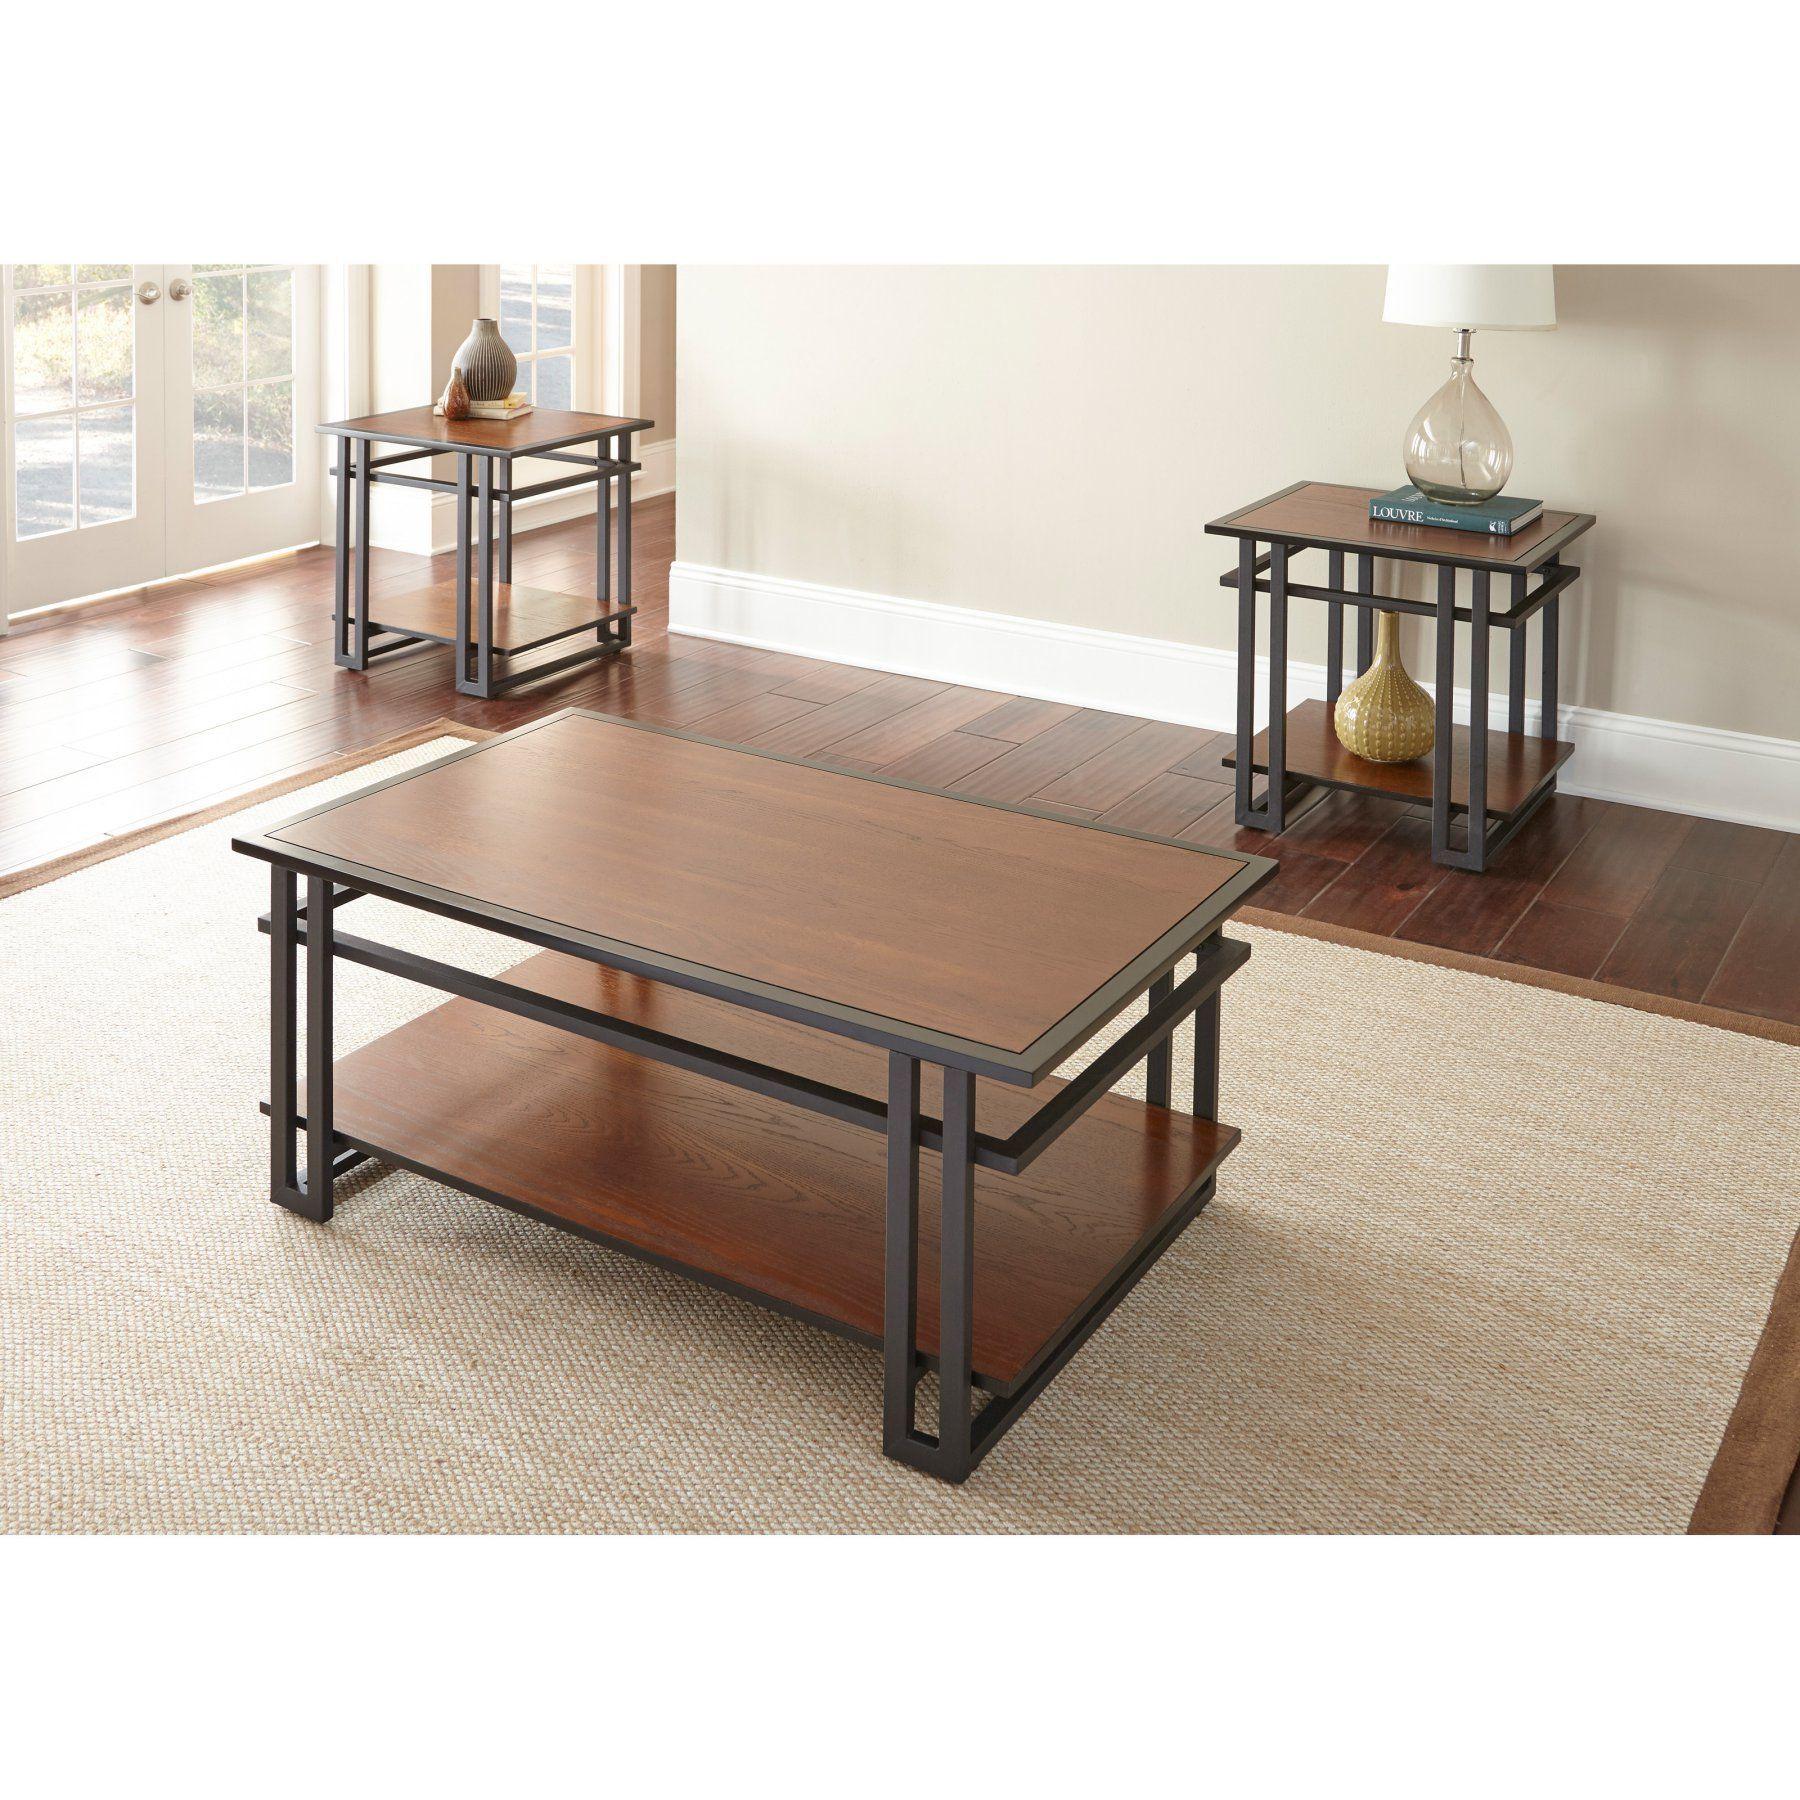 Steve Silver Micah 3 Piece Occasional Table Set Mh2000 Diseno Moderno De Muebles Muebles Hierro Y Madera Muebles [ 1800 x 1800 Pixel ]